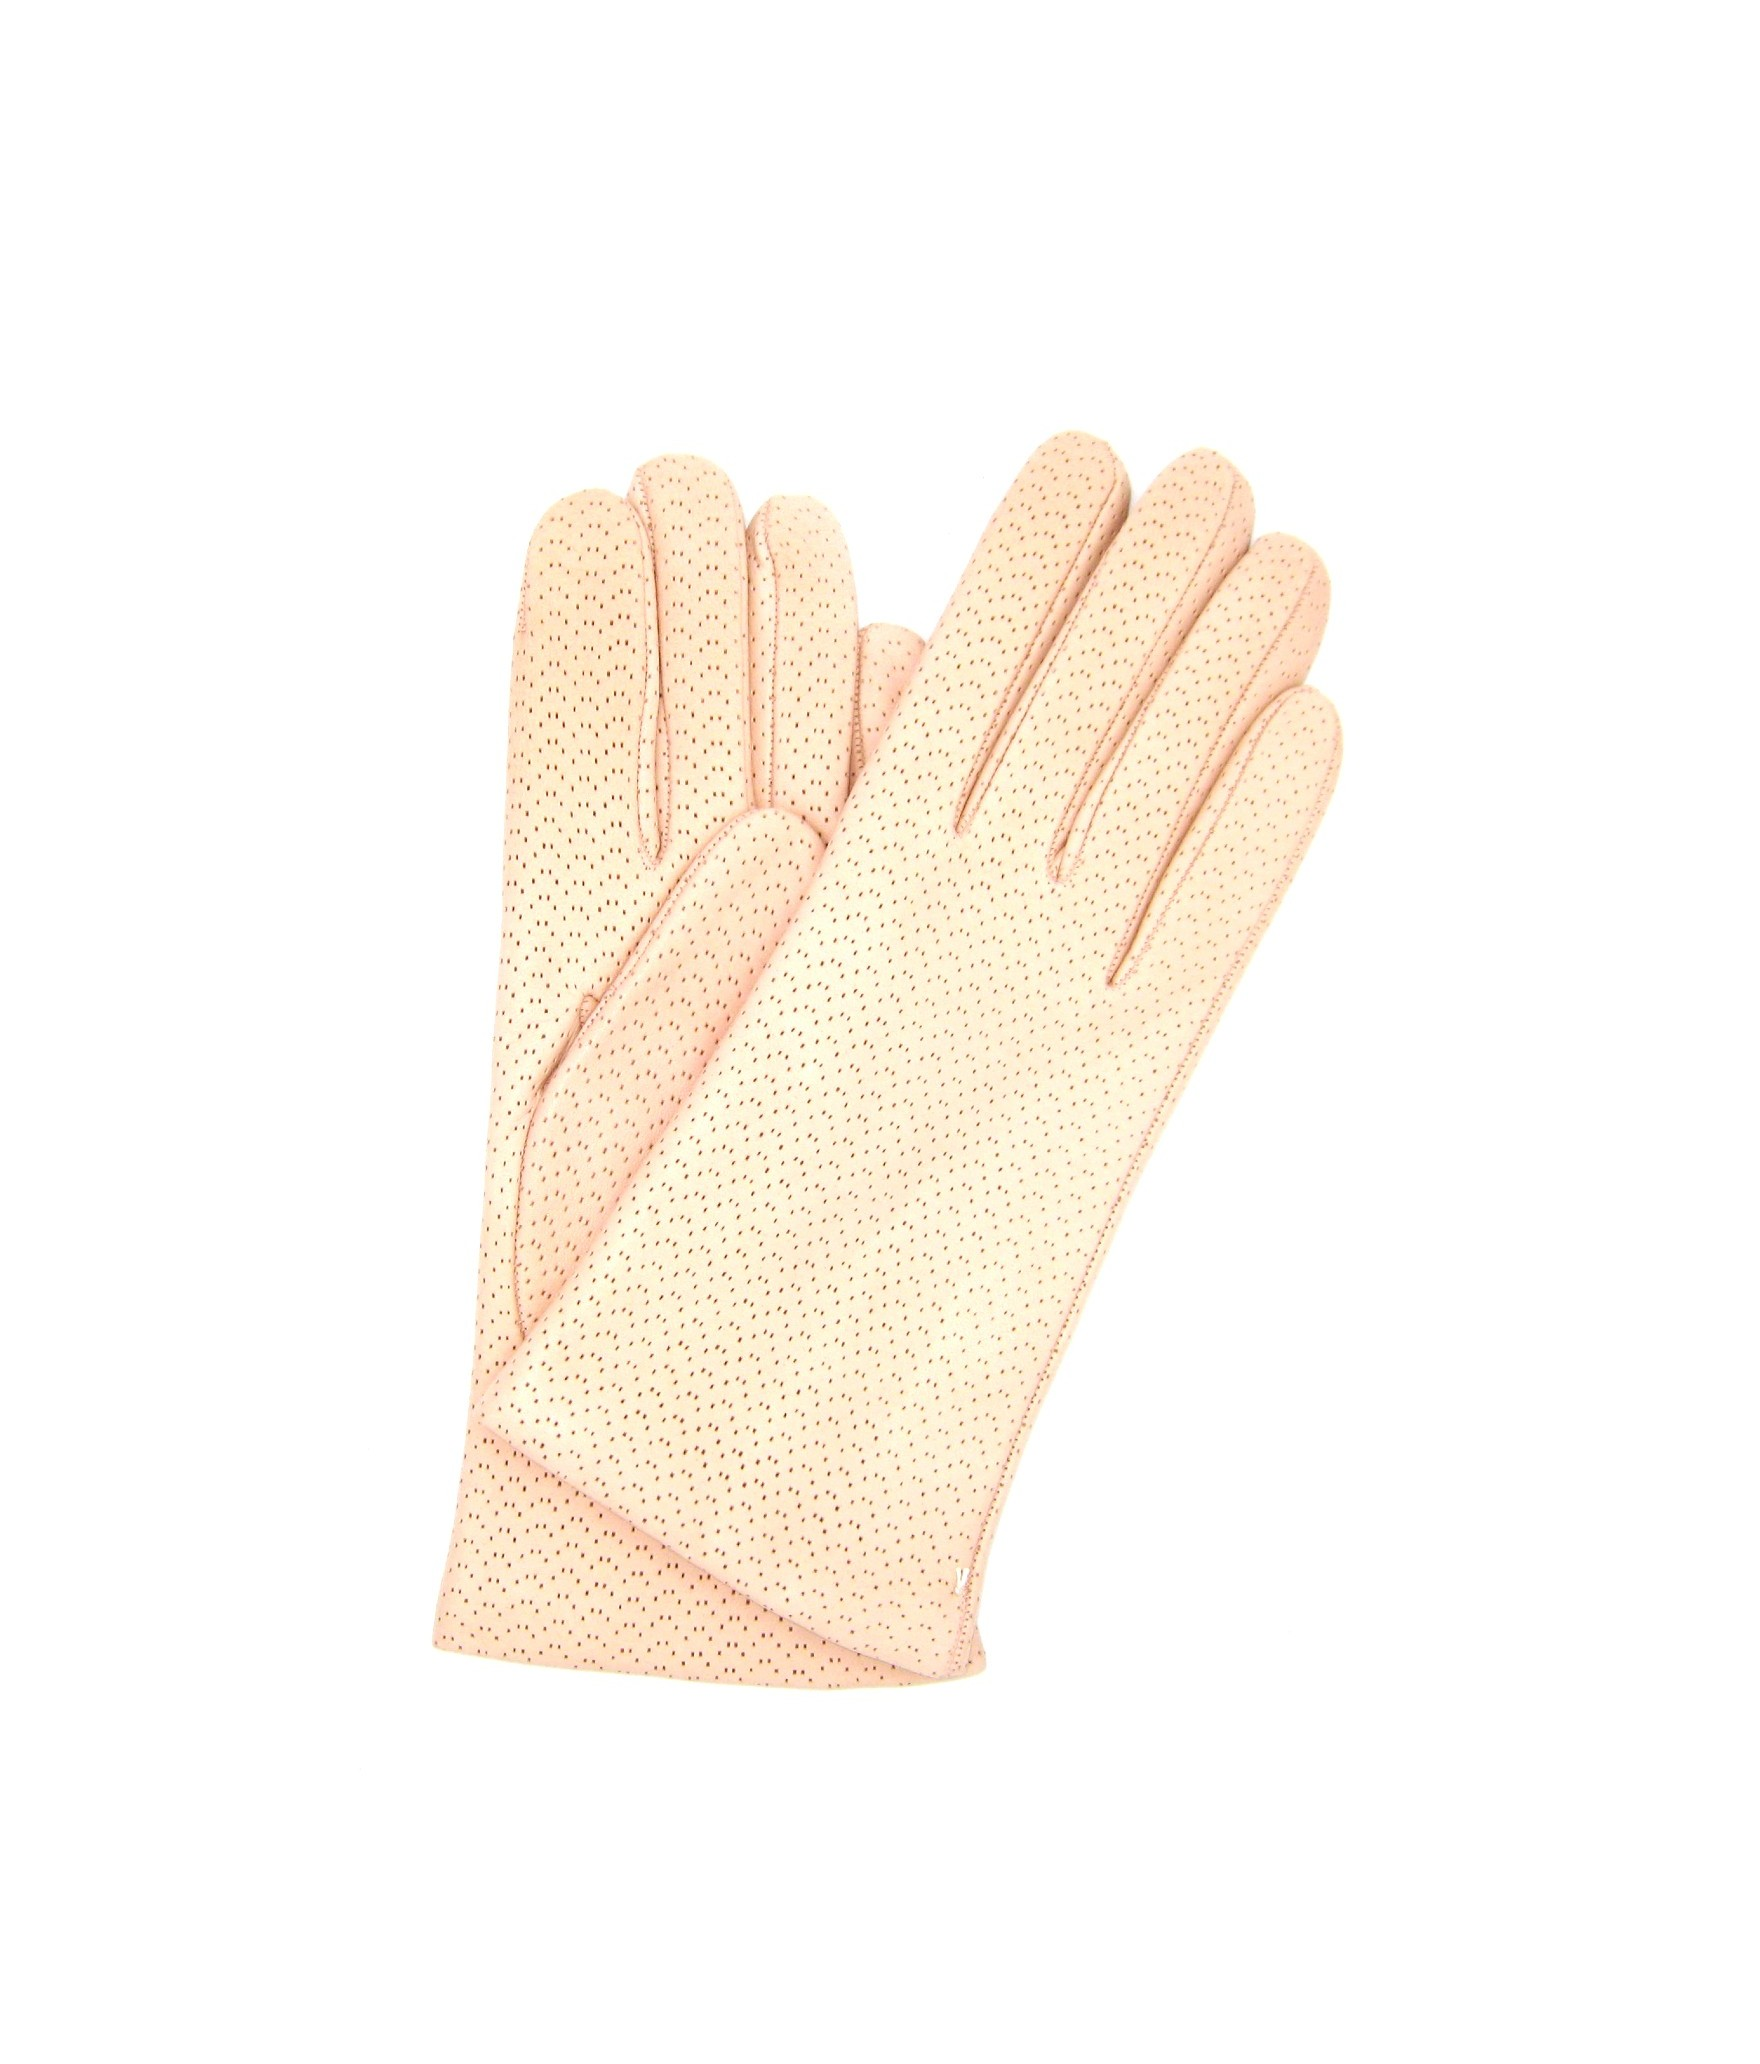 Nappa leather gloves 2bt, cashmere lined Light Pink Sermoneta